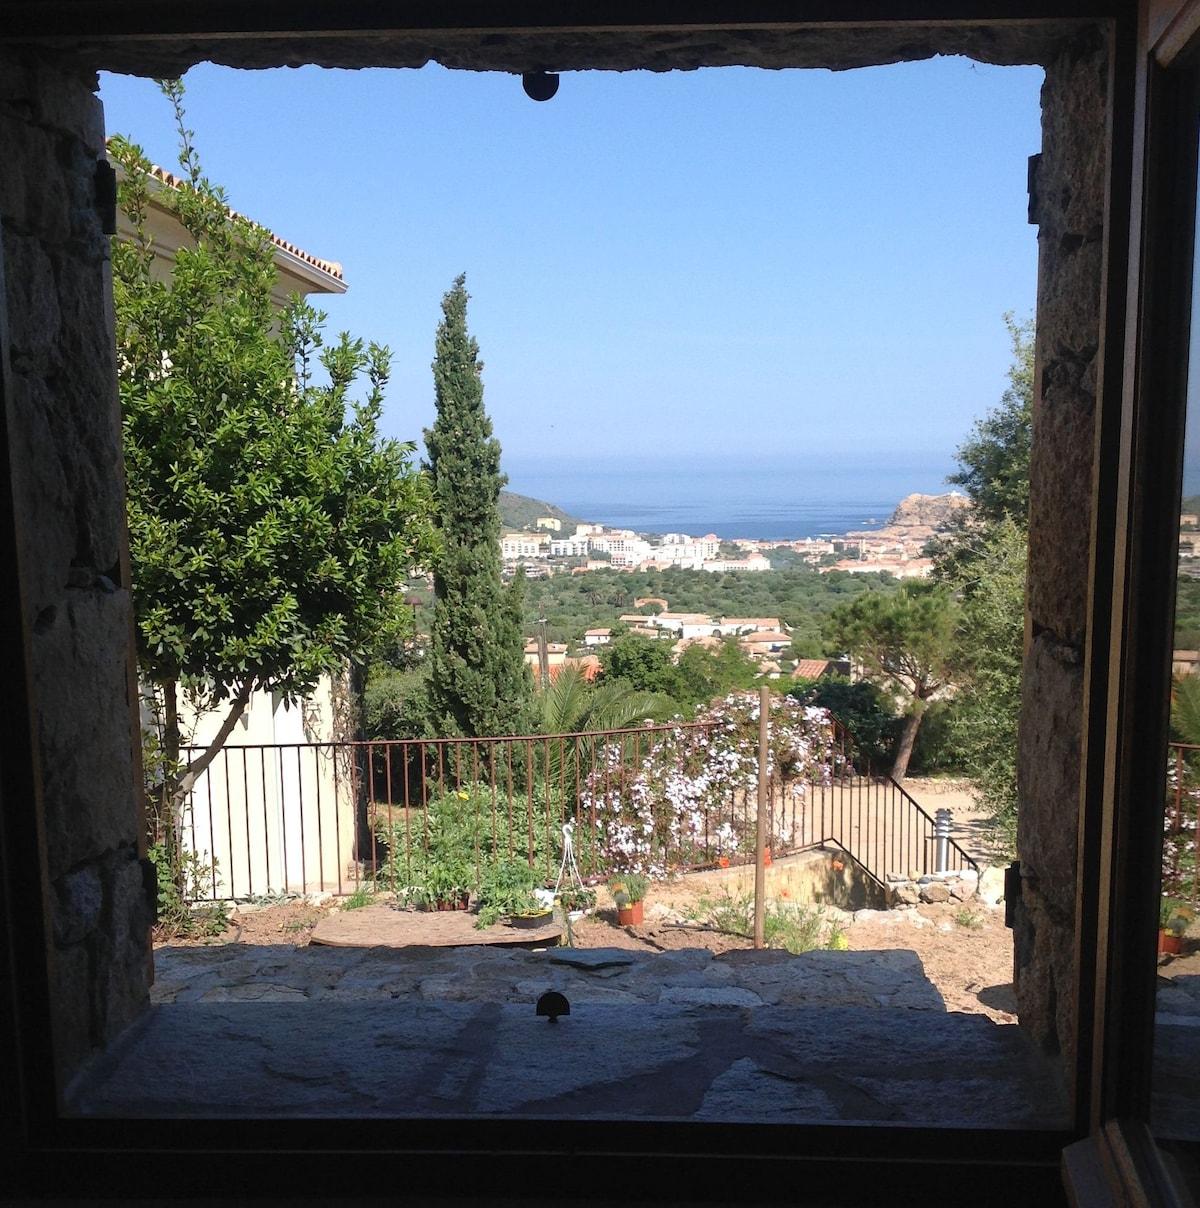 Vue mer par la fenêtre de la chambre